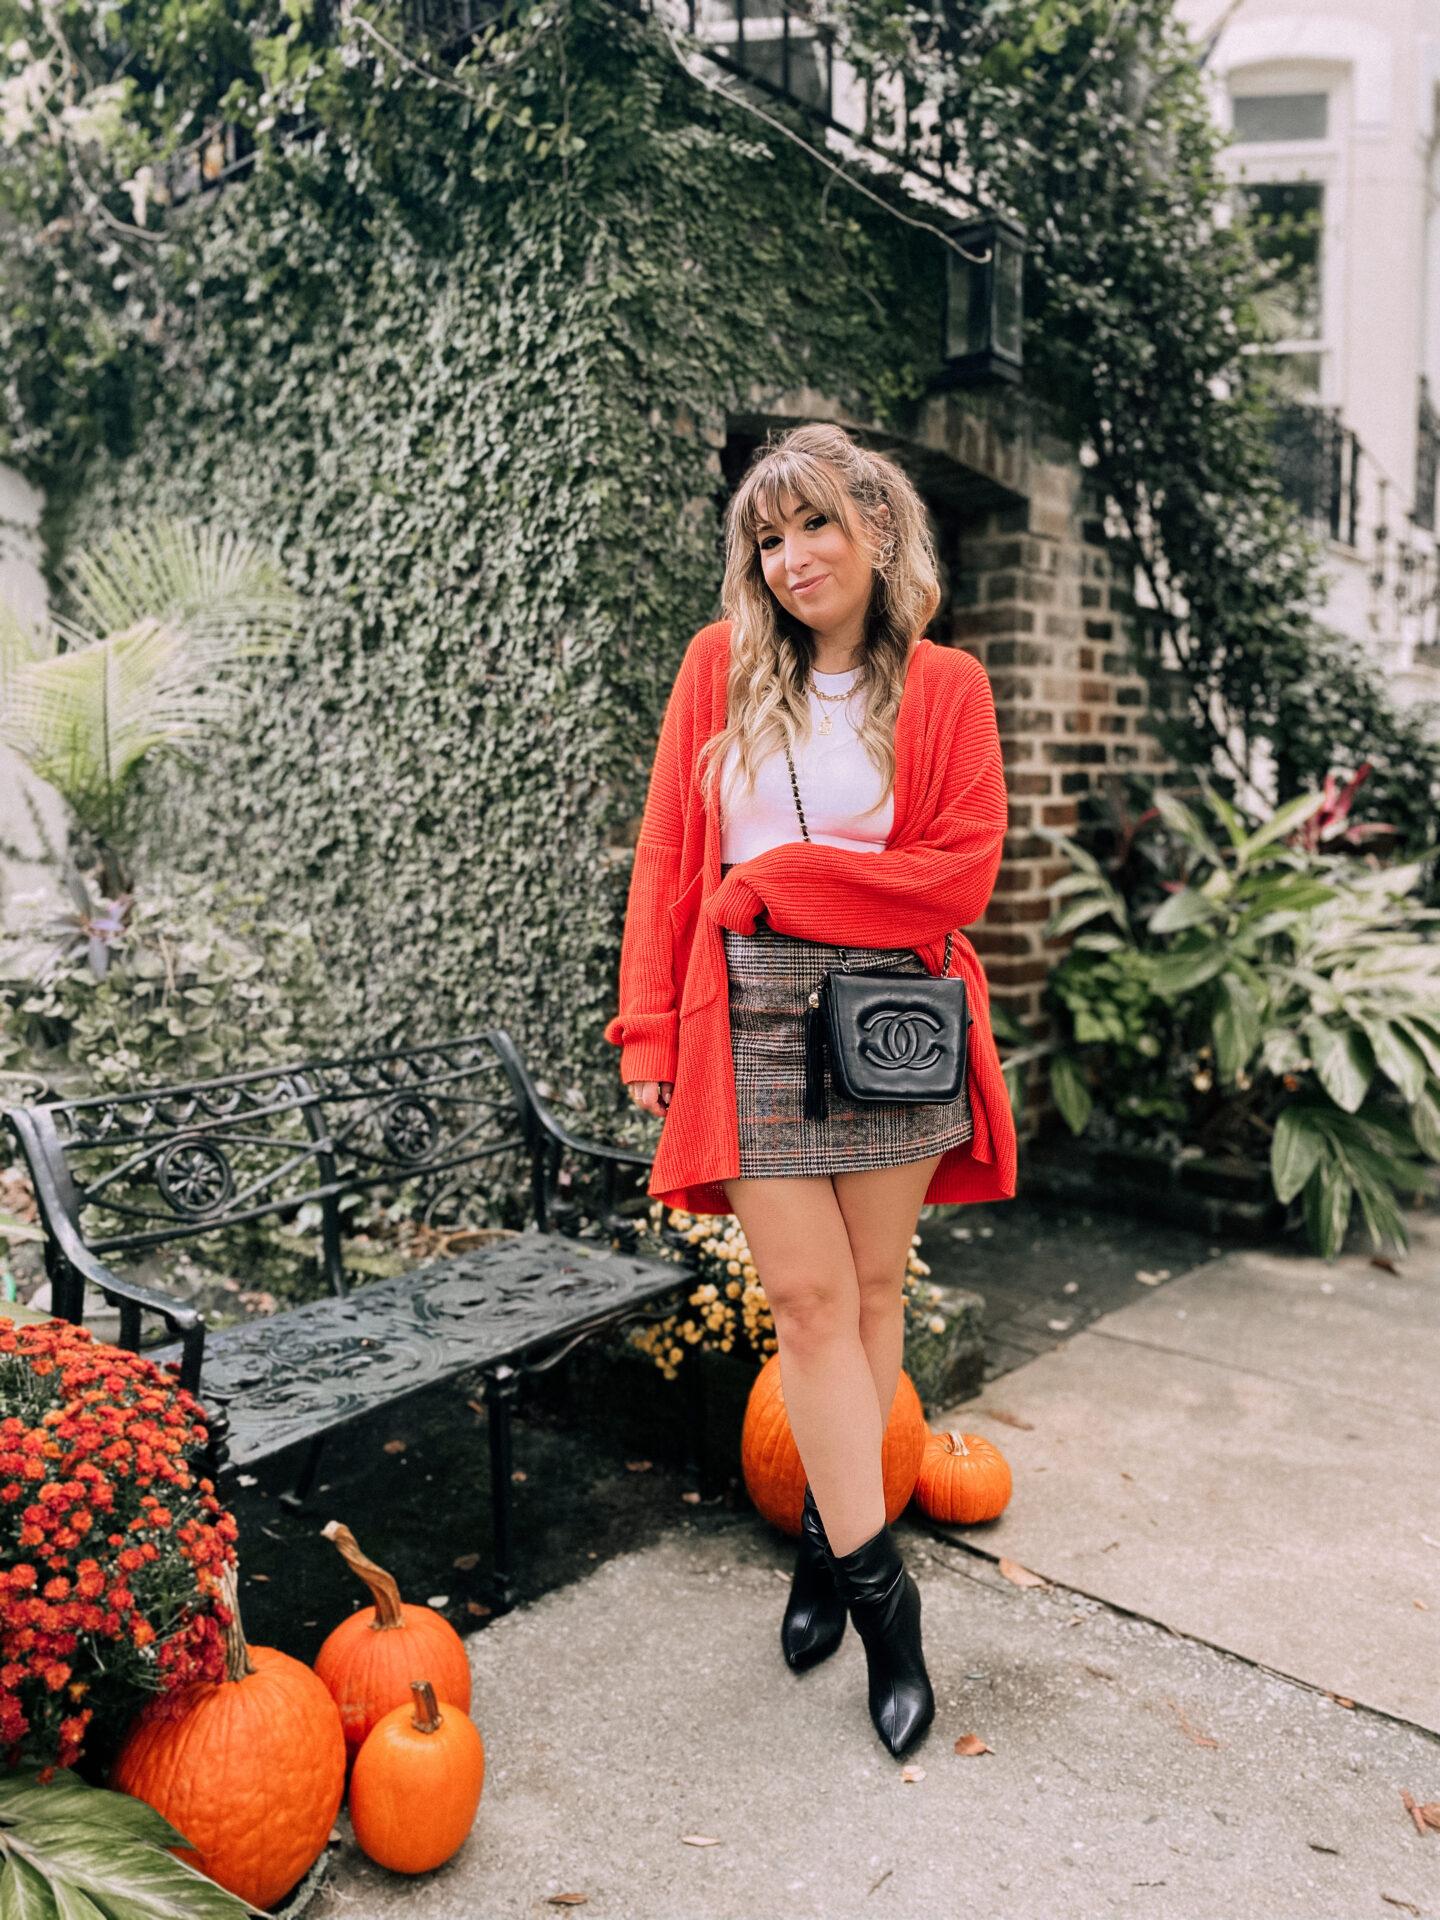 Cardigan, plaid skirt and booties